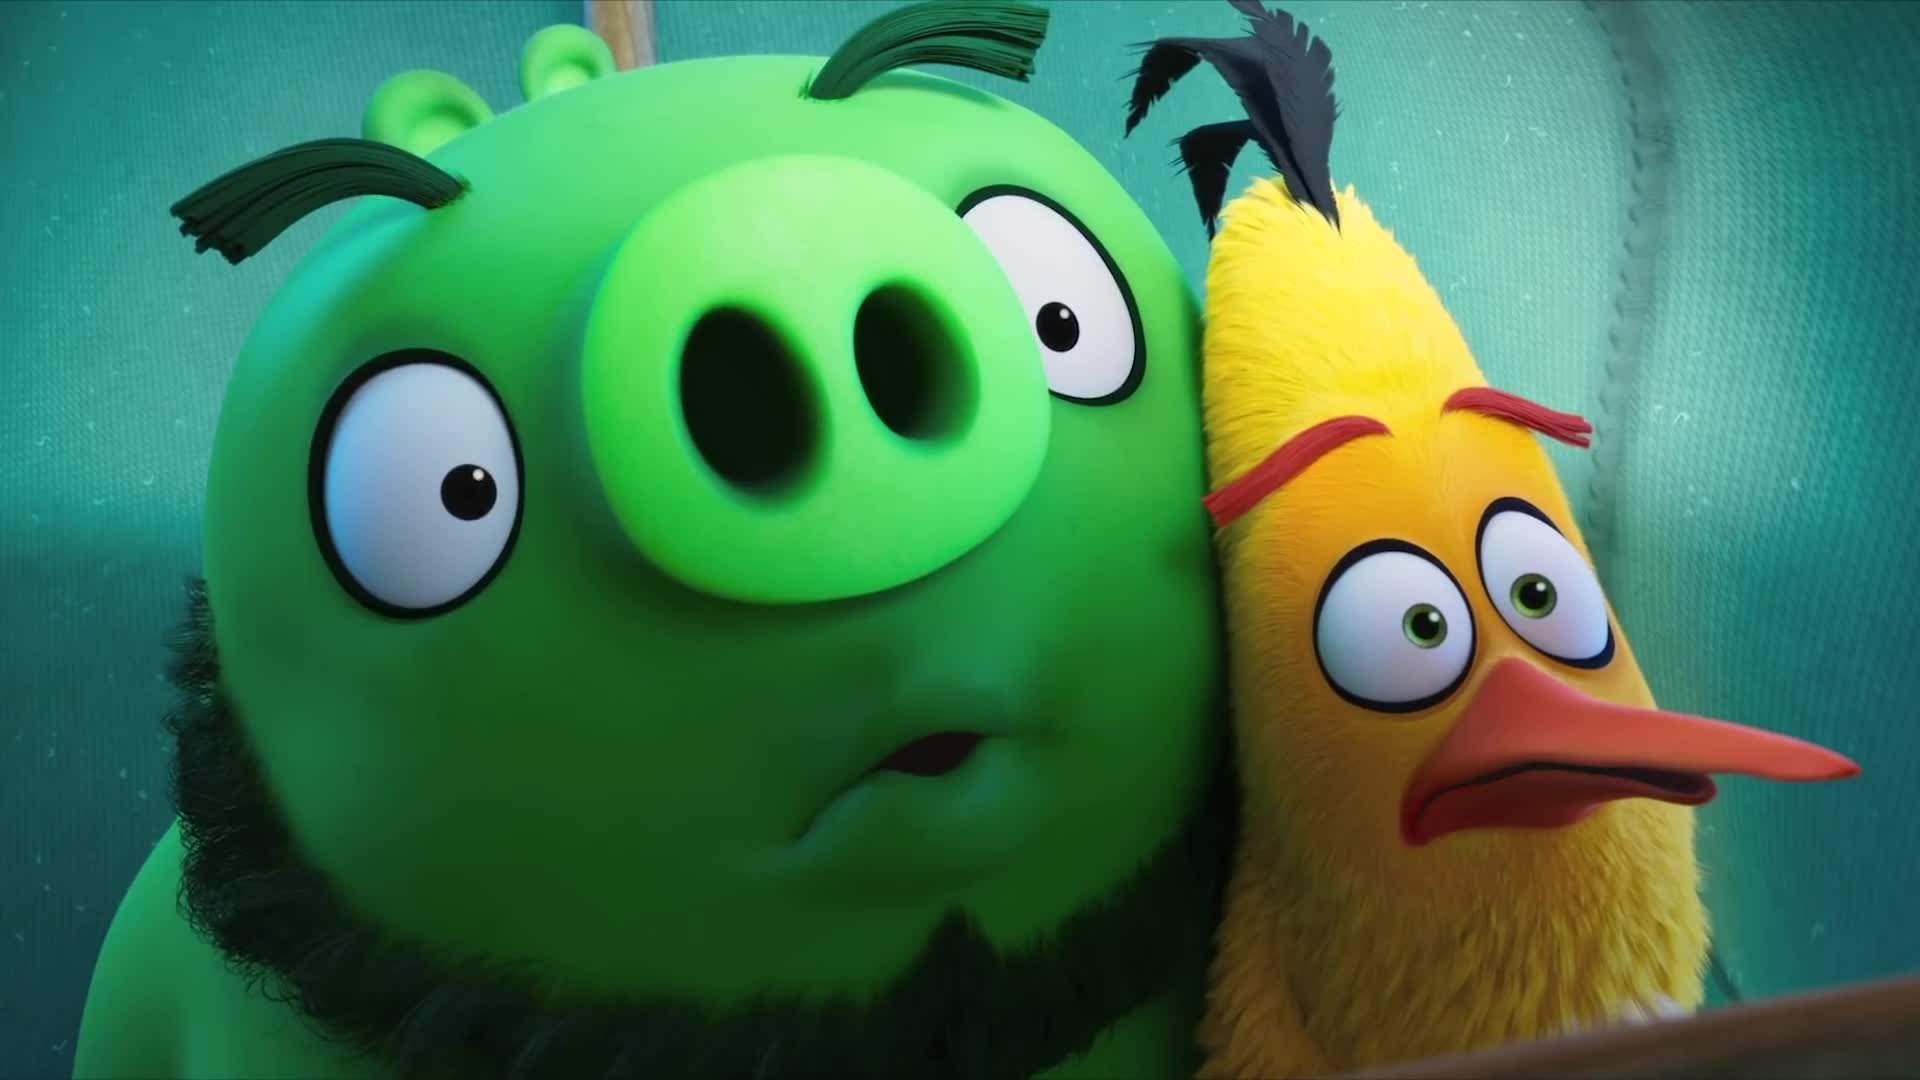 Trailer, Kinofilm, Kino, Angry Birds, Sony Pictures, Sony Pictures Entertainment, Angry Birds 2, The Angry Birds Movie, The Angry Birds Movie 2